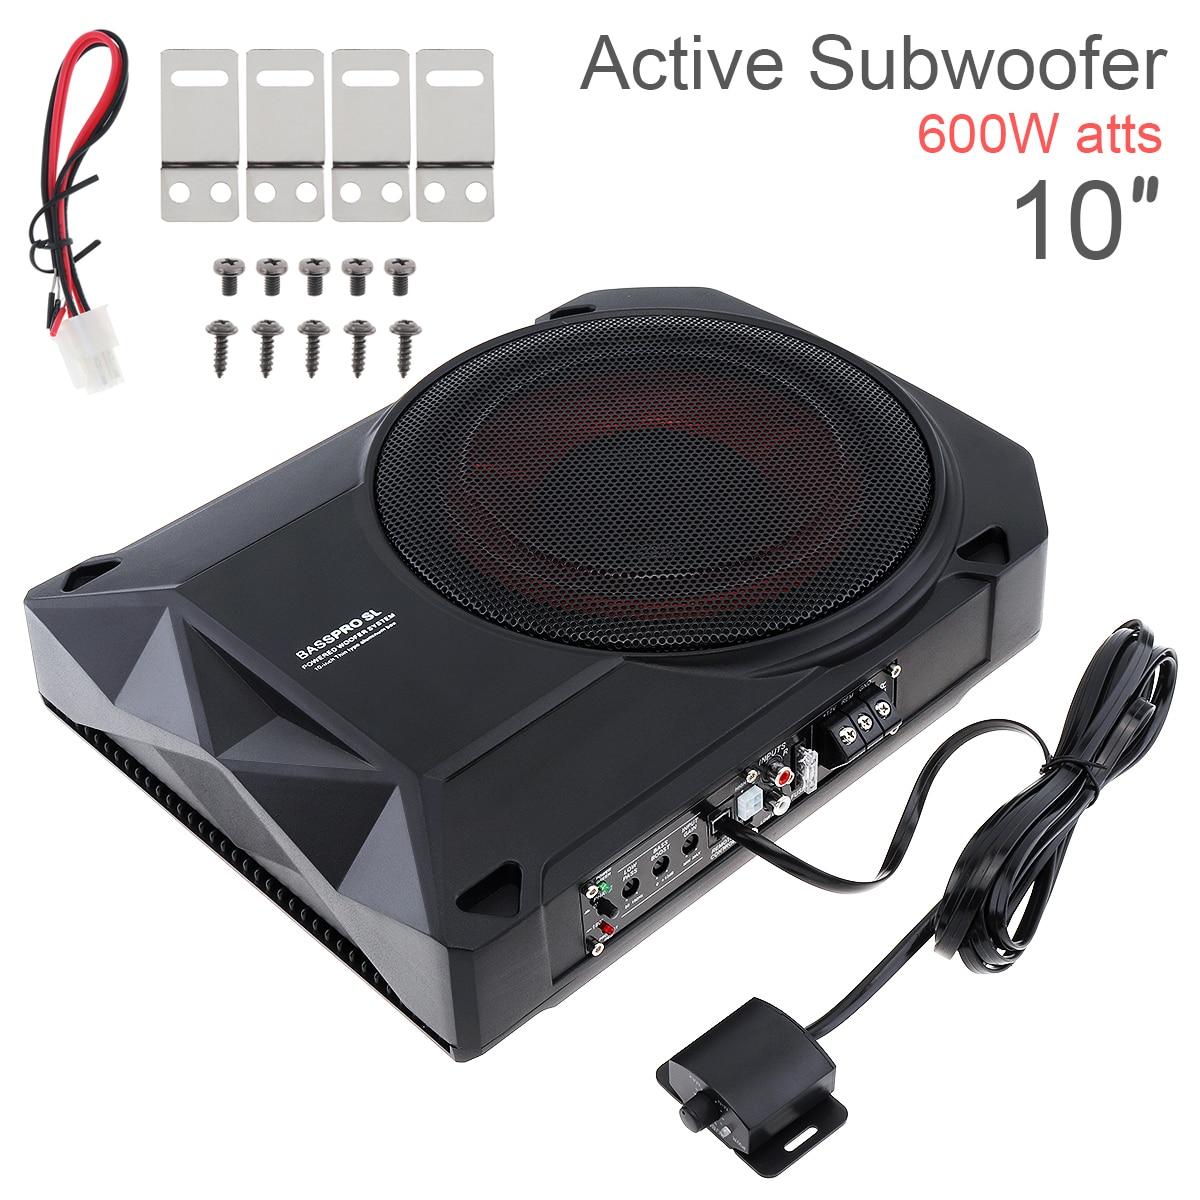 Universal 10 Zoll Auto Subwoofer Lautsprecher 600W Dünne Auto Unter Sitz Schlank Aktive Subwoofer Bass Verstärker Lautsprecher mit RCA eingang